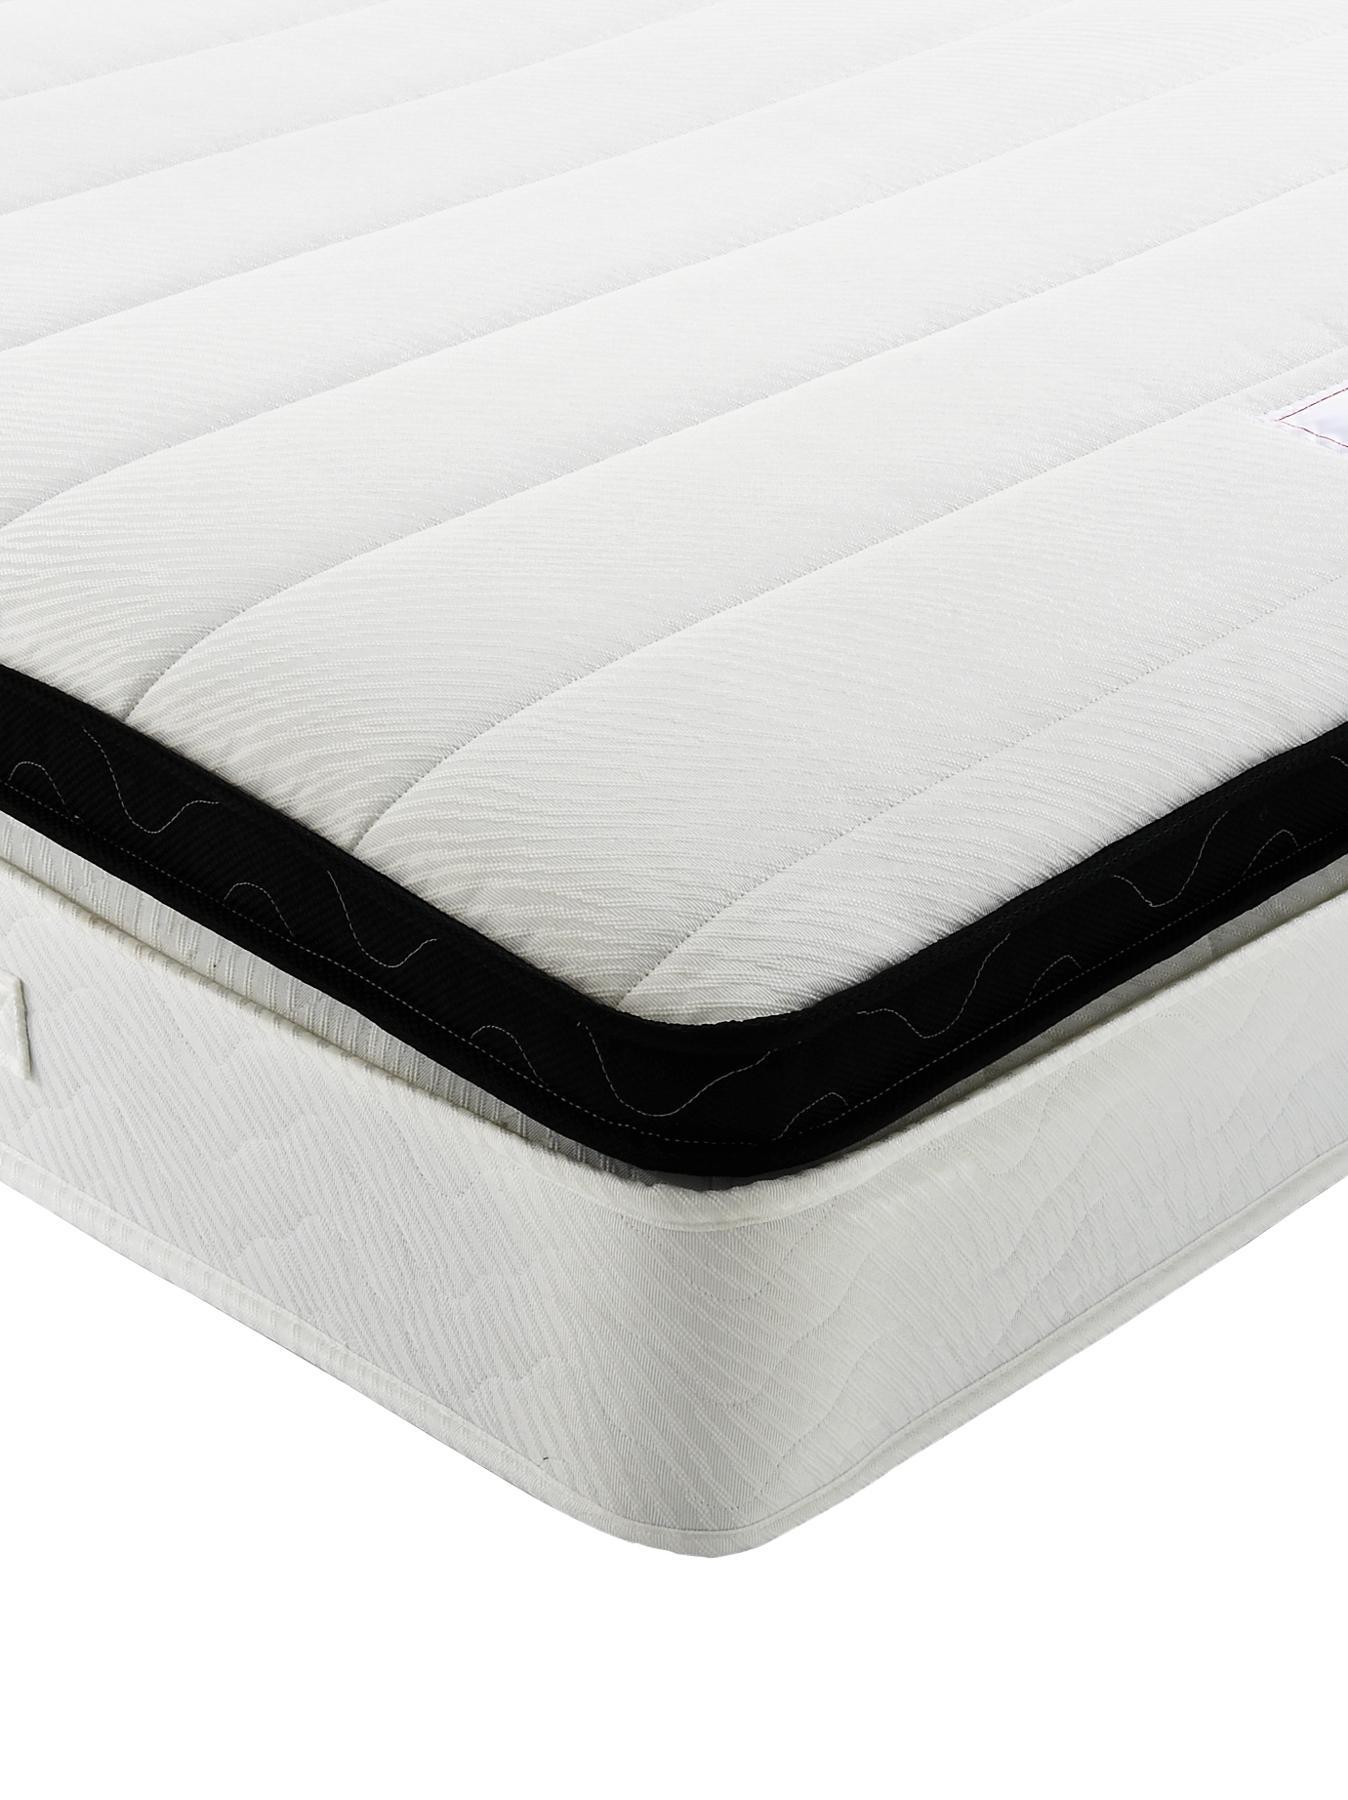 Wincham Deep Comfort Box Top Mattress - Medium, Beige,Black